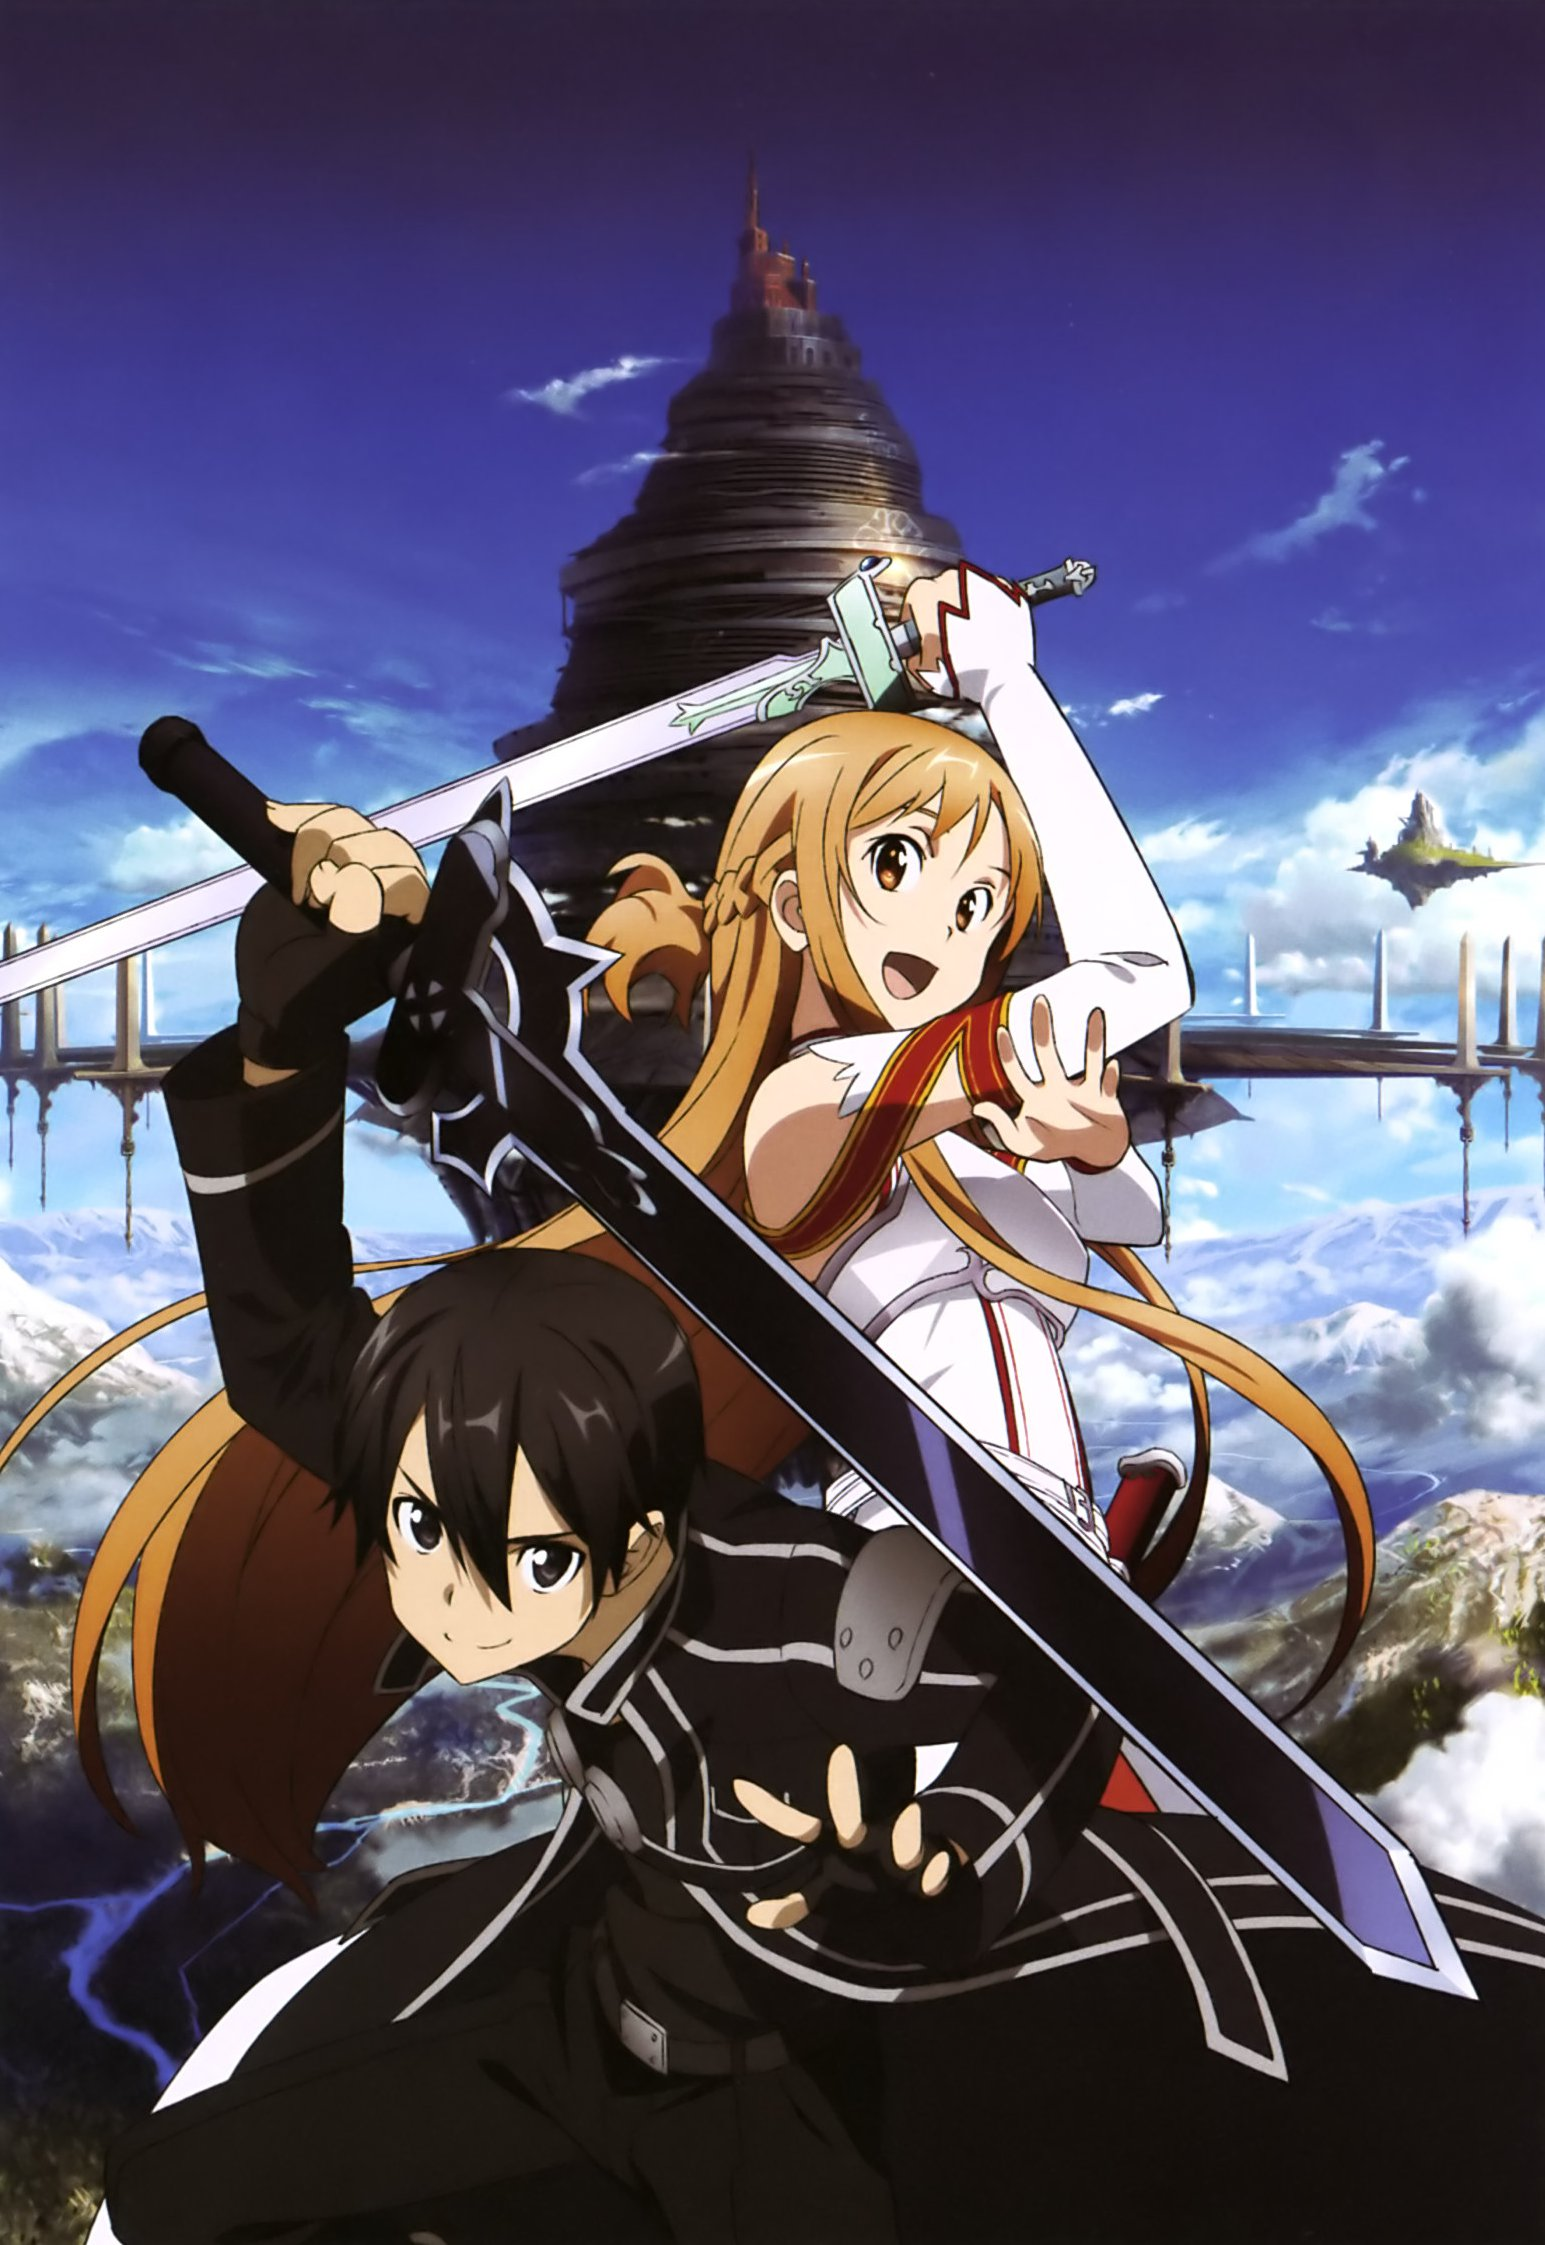 Sword Art Online Movie Ordinal Scale Wallpapers Anime Hq Sword